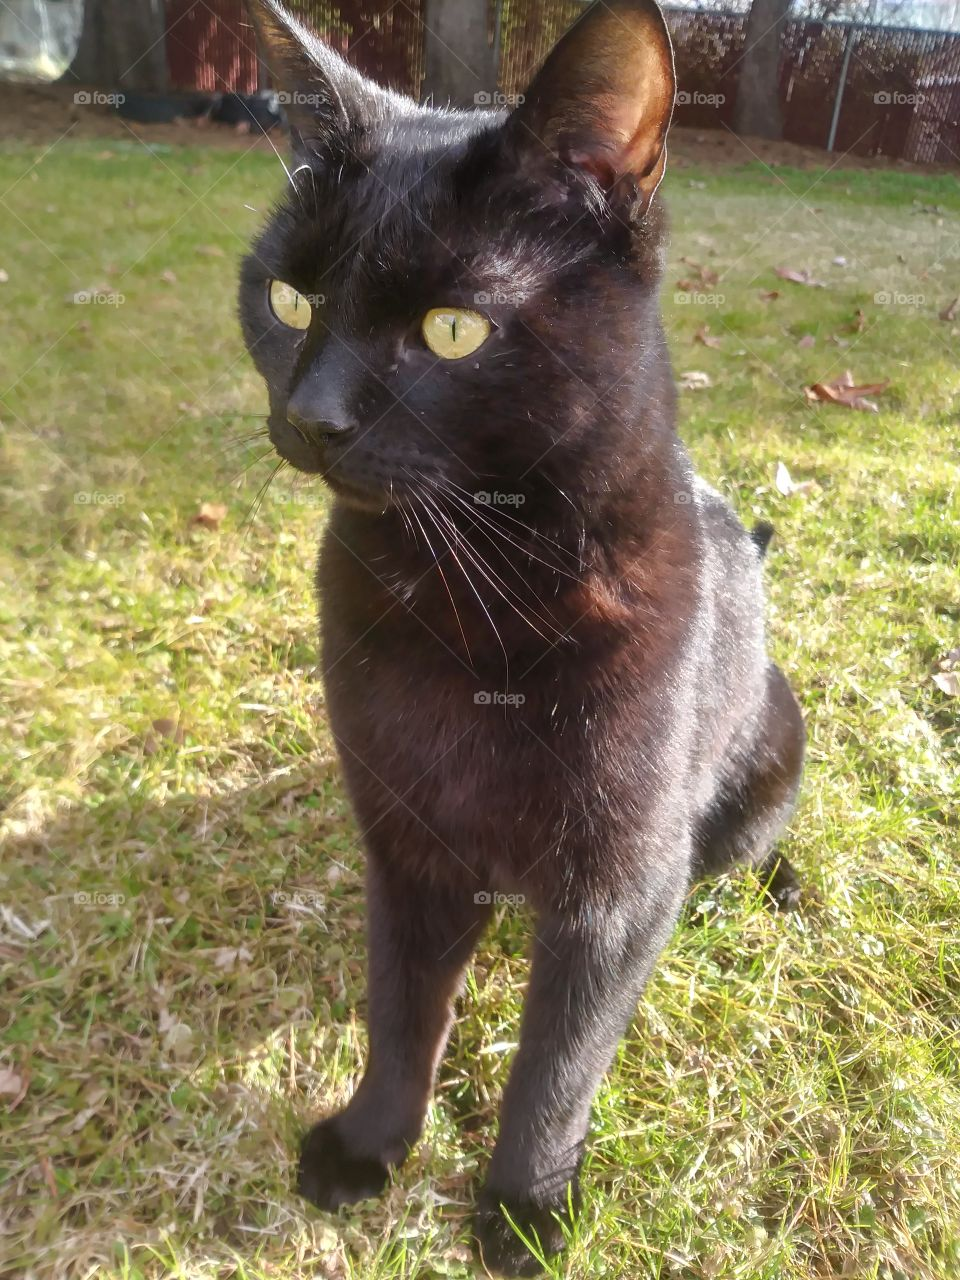 A black cat named Sebastian enjoying the day 💖